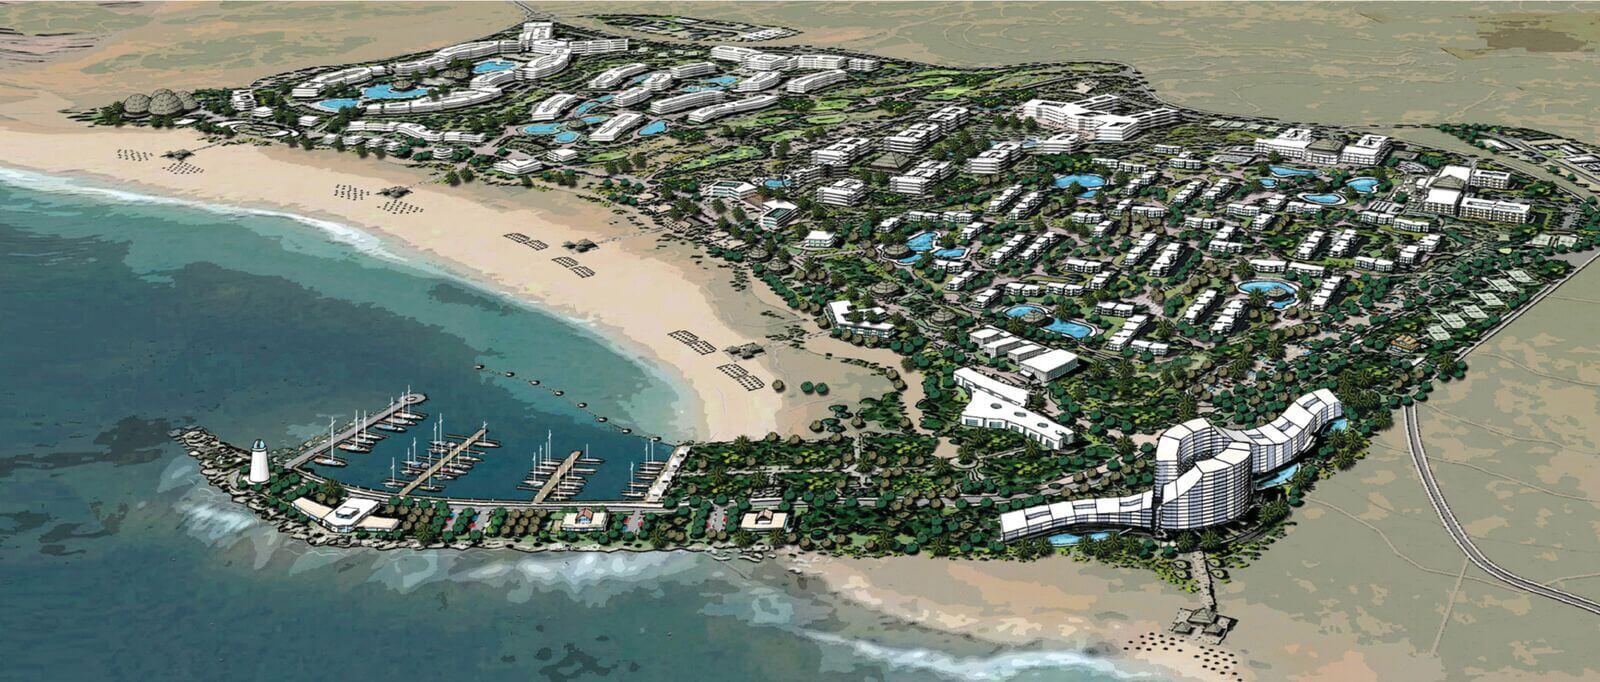 Immobilien Kap Verde kaufen